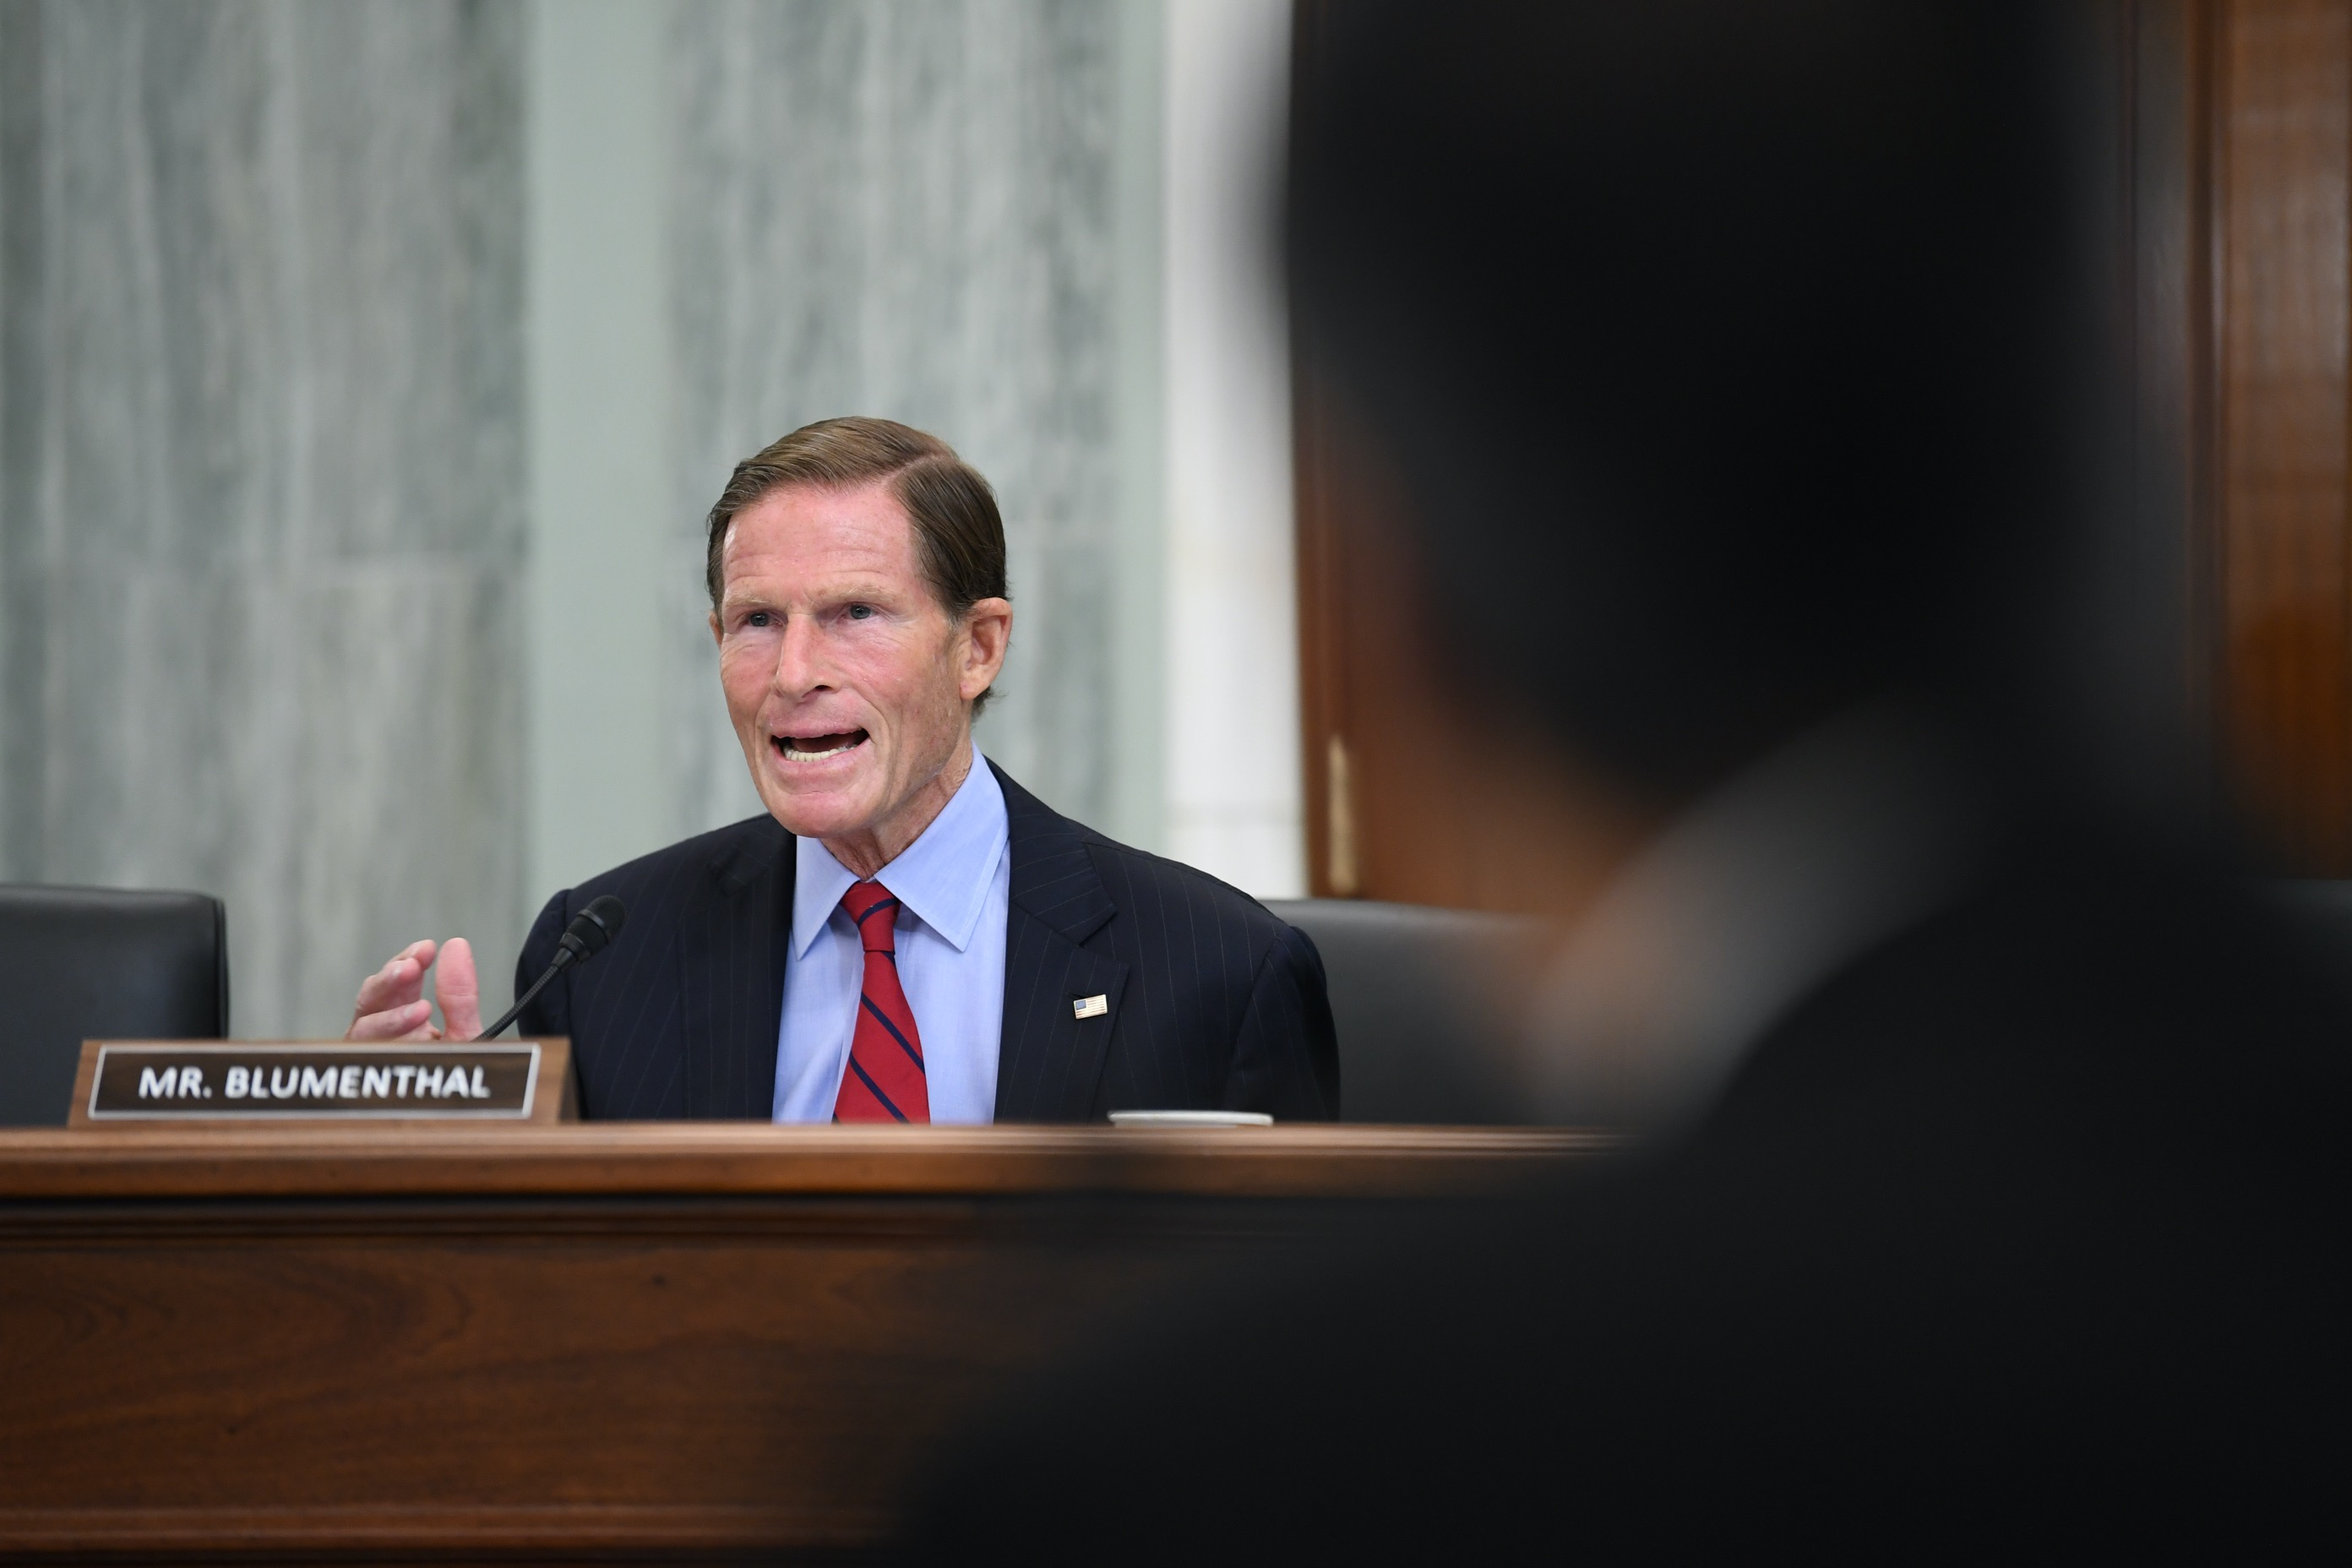 Senate Rushes To Confirm Trump Fcc Nominee In Order To Hinder Biden Admin Ars Technica